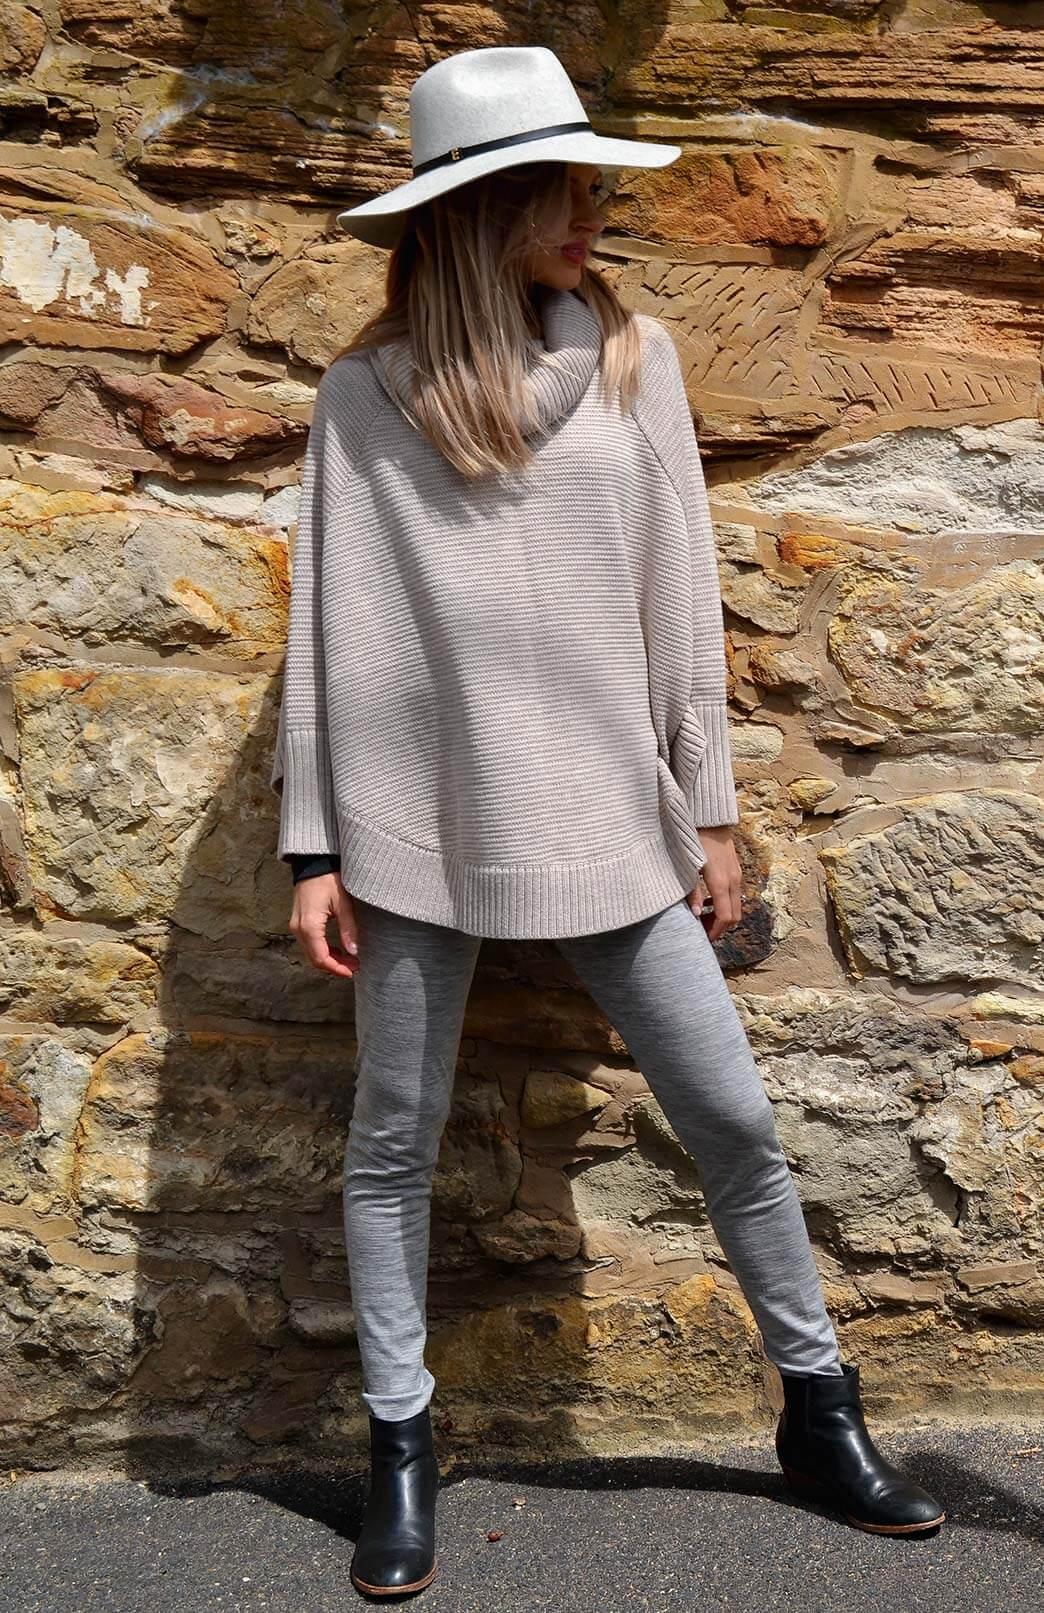 Chunky Merino Wool Cowl Neck Poncho With Sleeves - Women's Oatmeal Wool Poncho with sleeves and cowl neck line - Smitten Merino Tasmania Australia